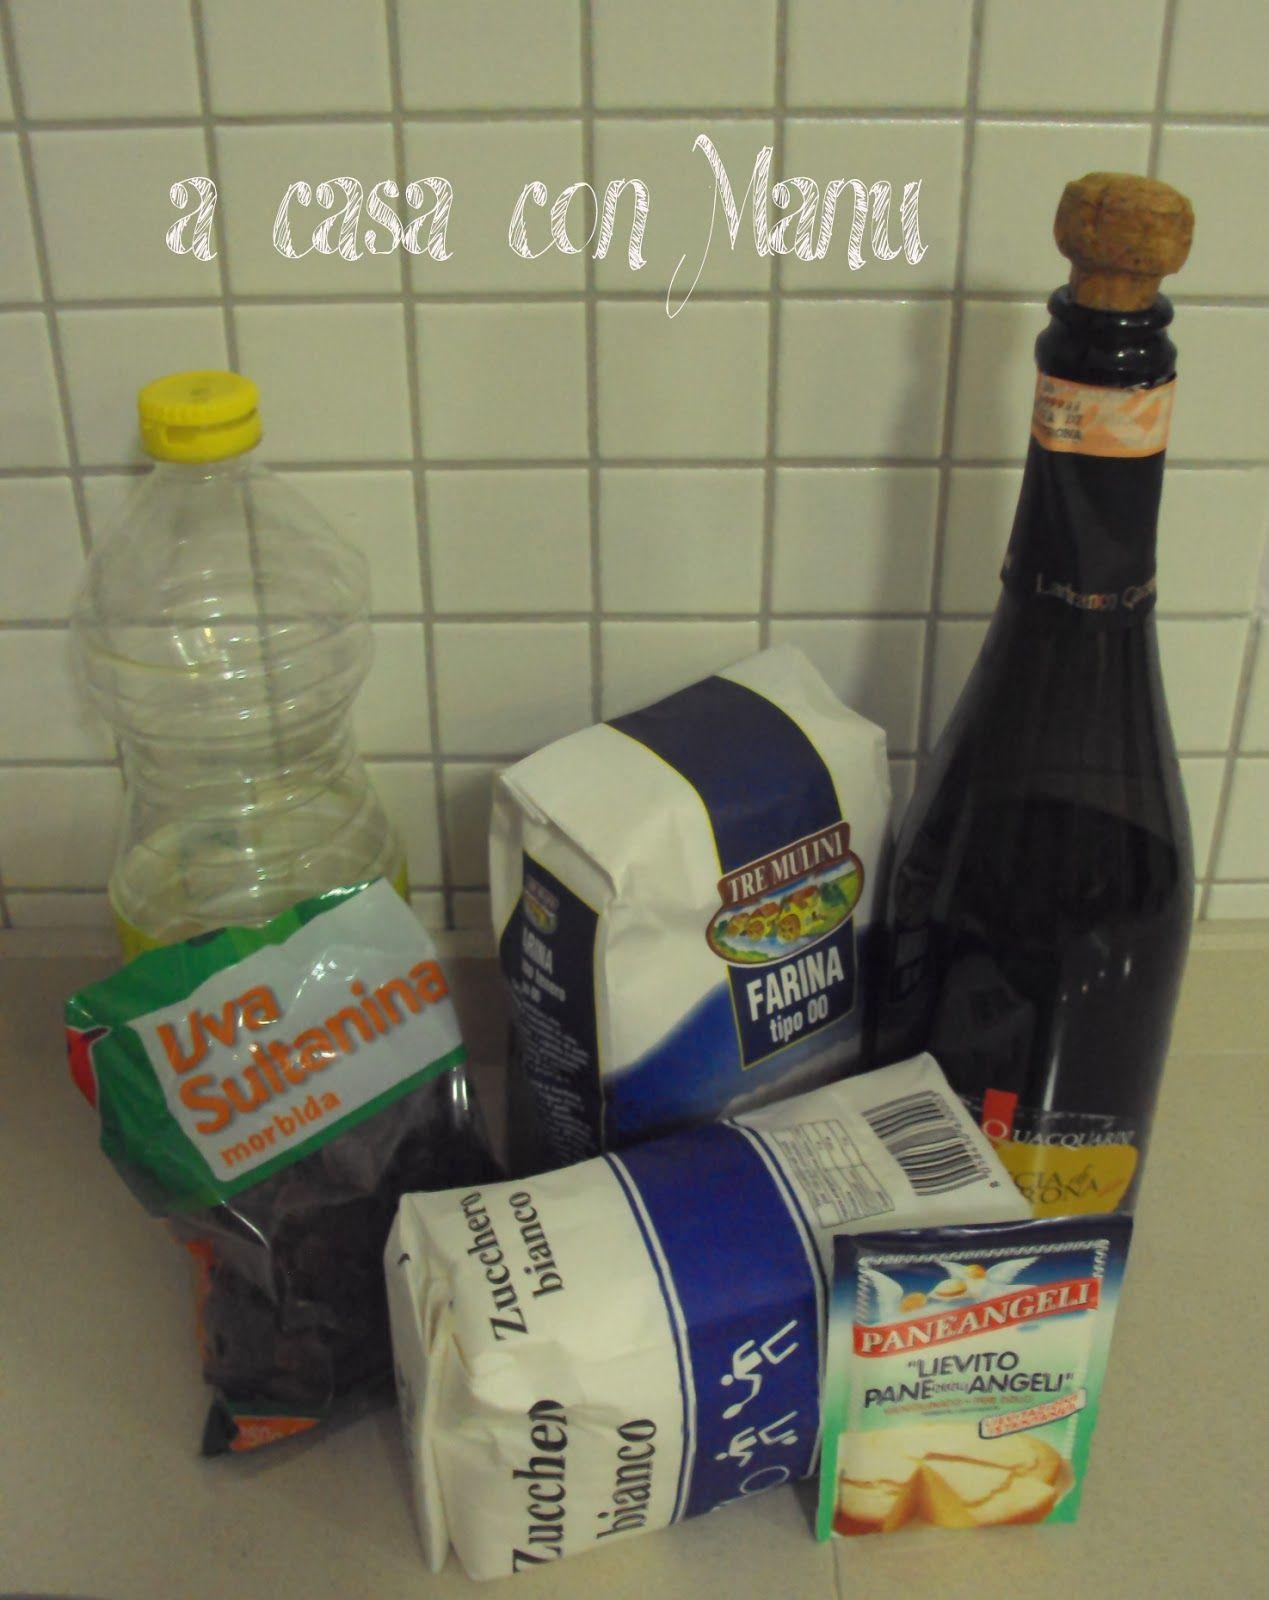 ... a casa con Manu: Biscotti al vino